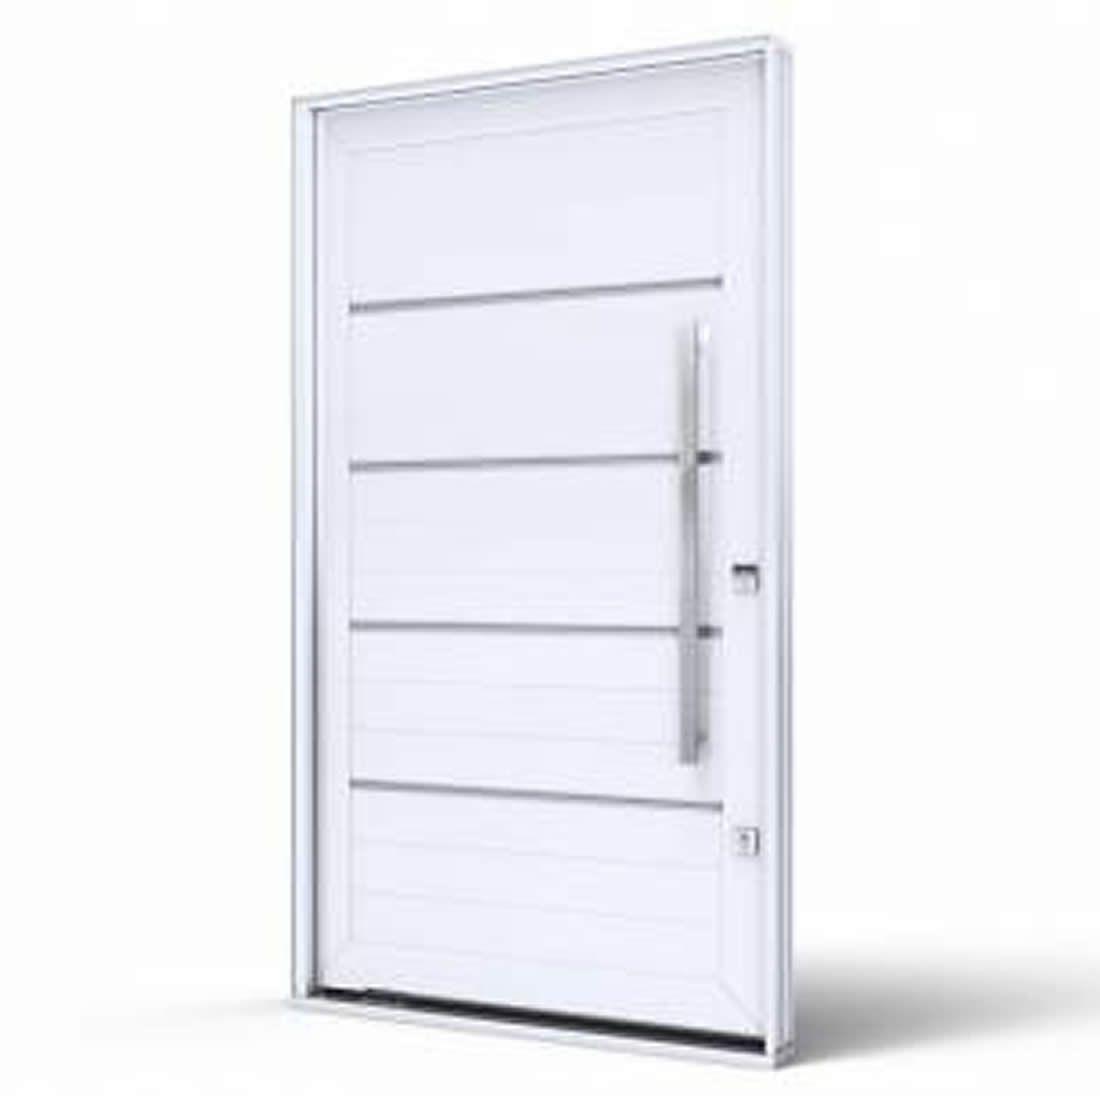 Porta Pivotante de Aluminio Branca C/Friso Abertura Esquerda Ref: 9190.1